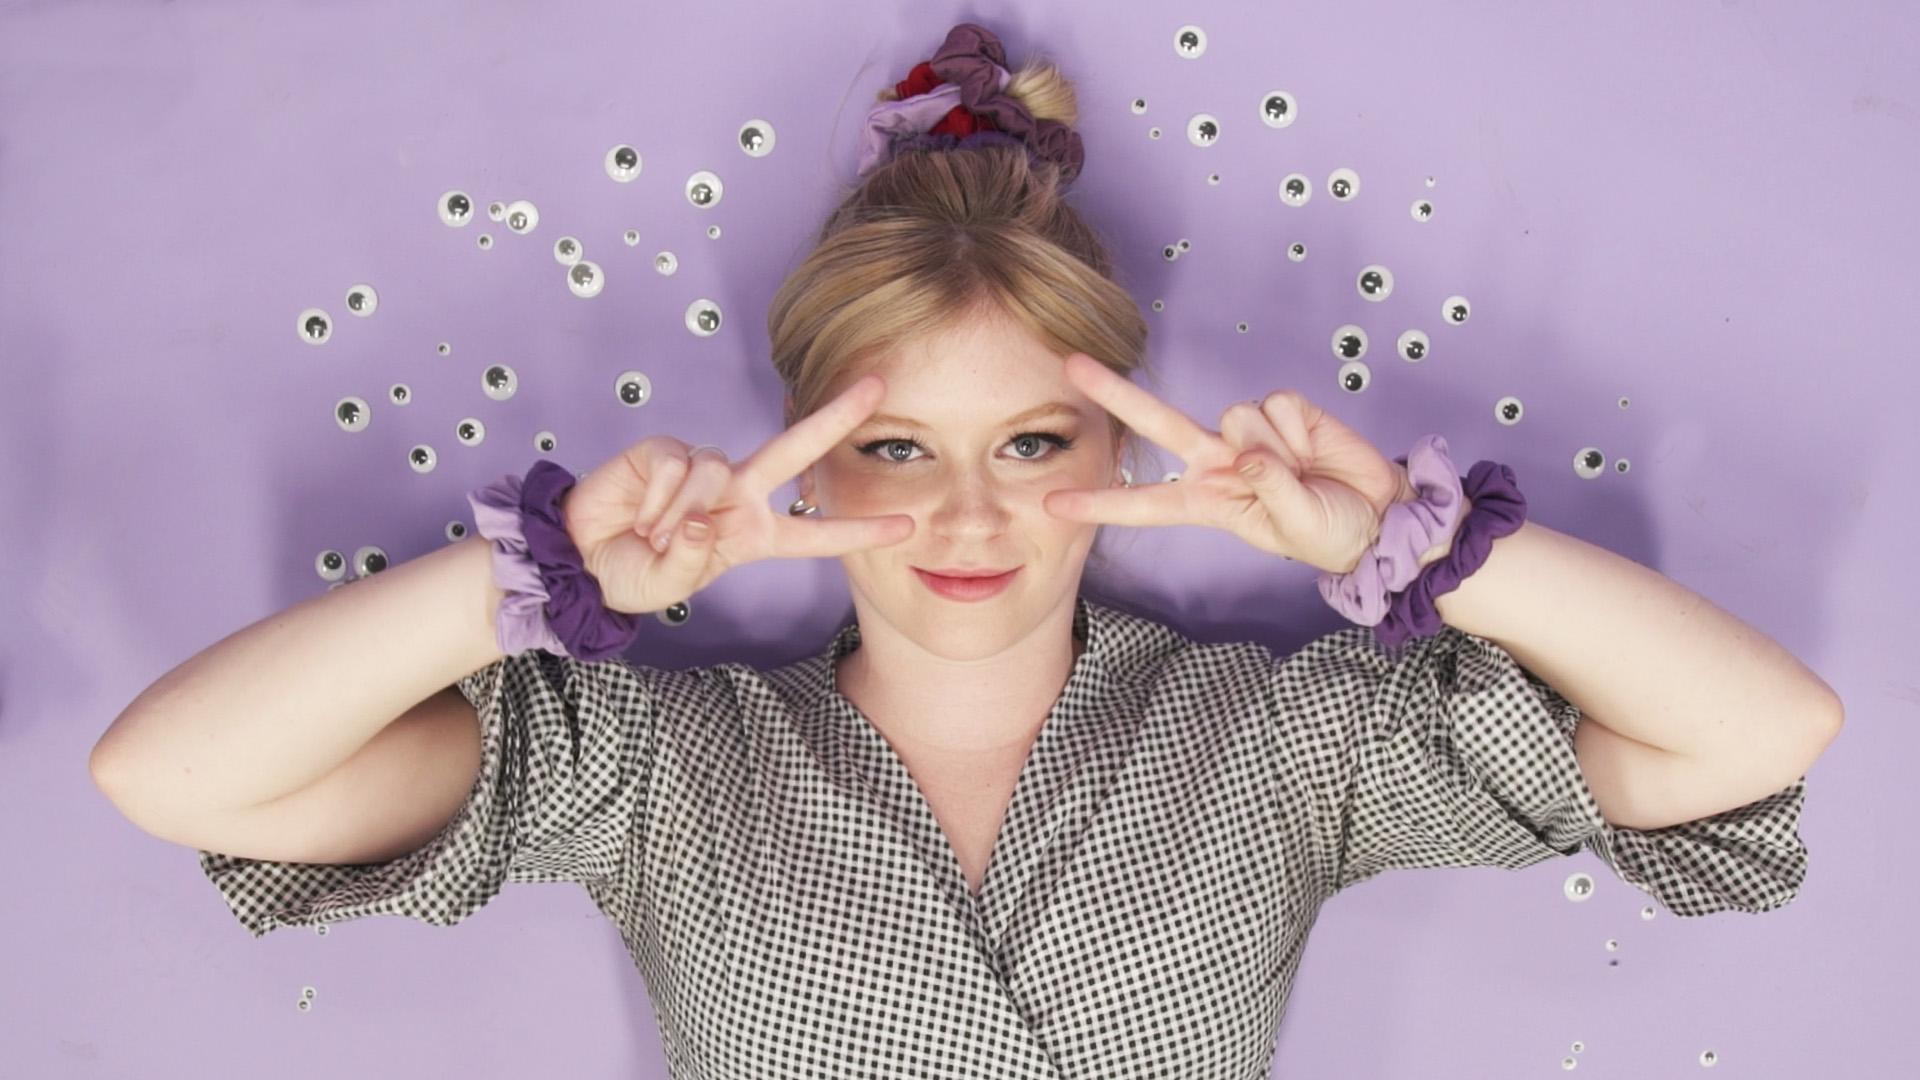 A woman wearing scrunchies